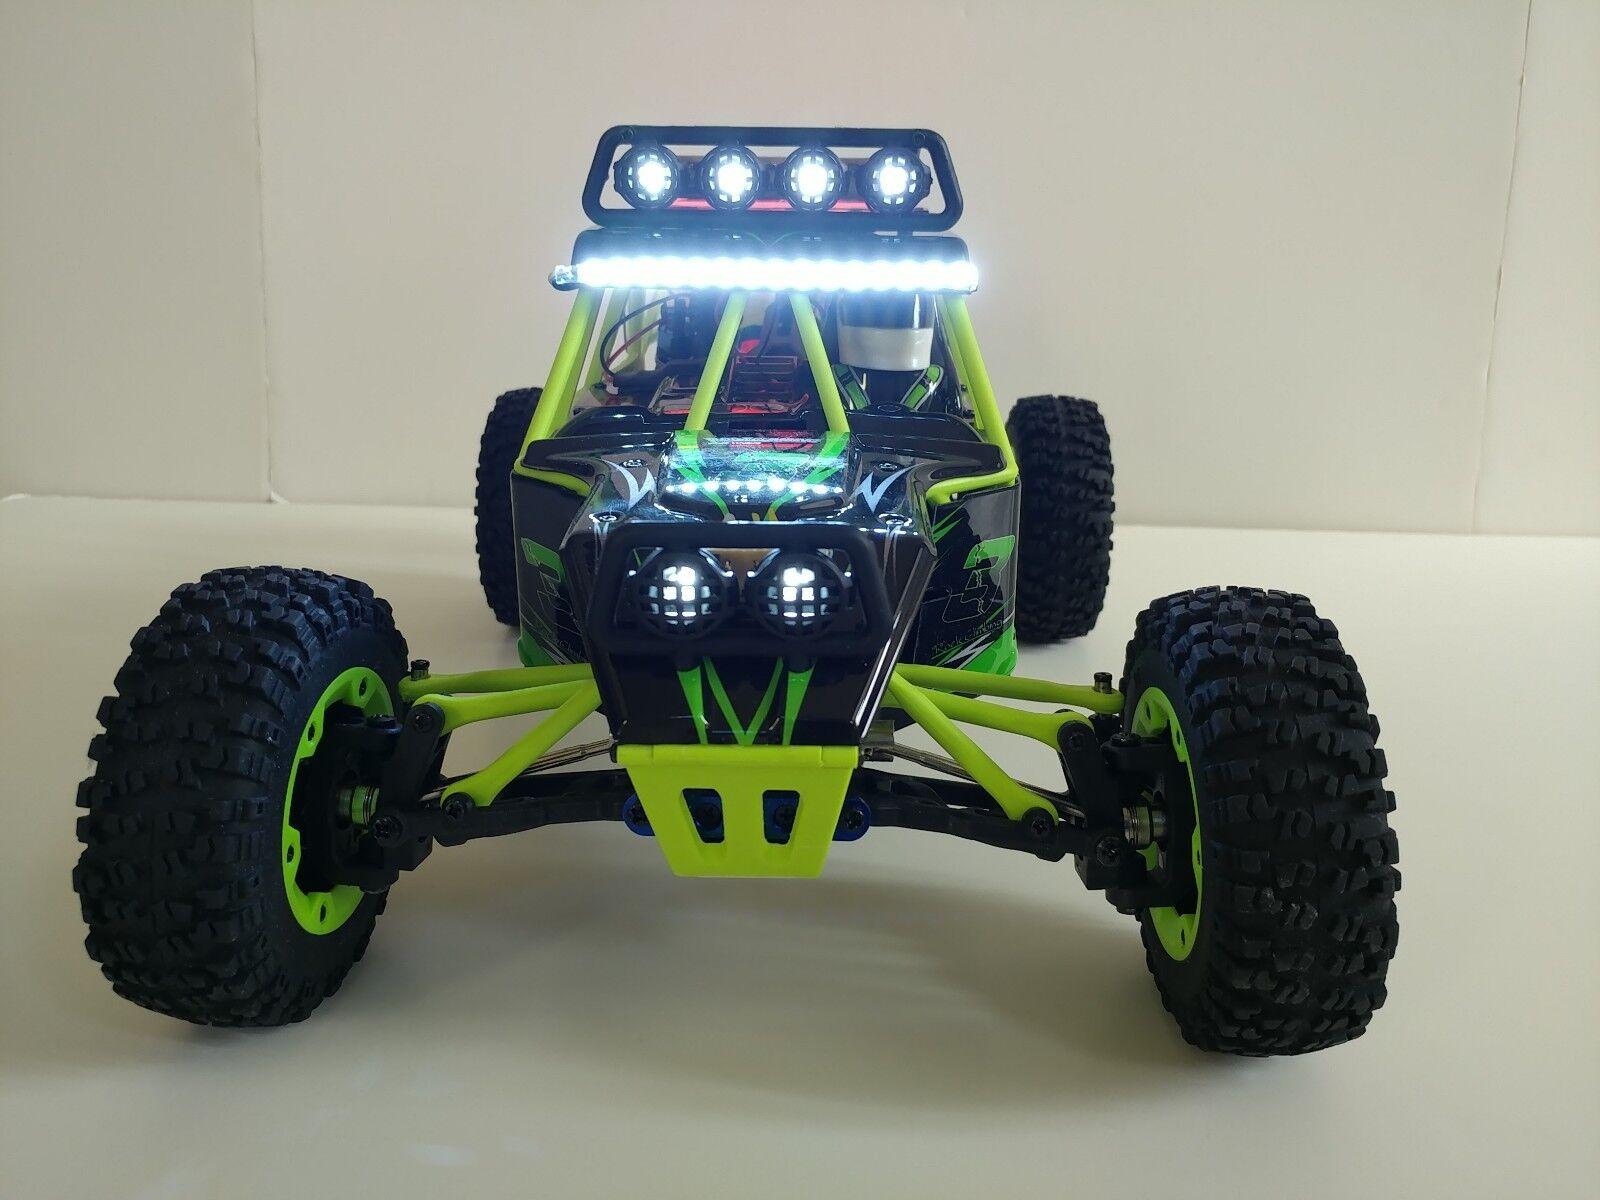 Arrive before Xmas. Wltoys 12428 RC 4WD racer racer racer w/front & rear LED light bar. abd1da